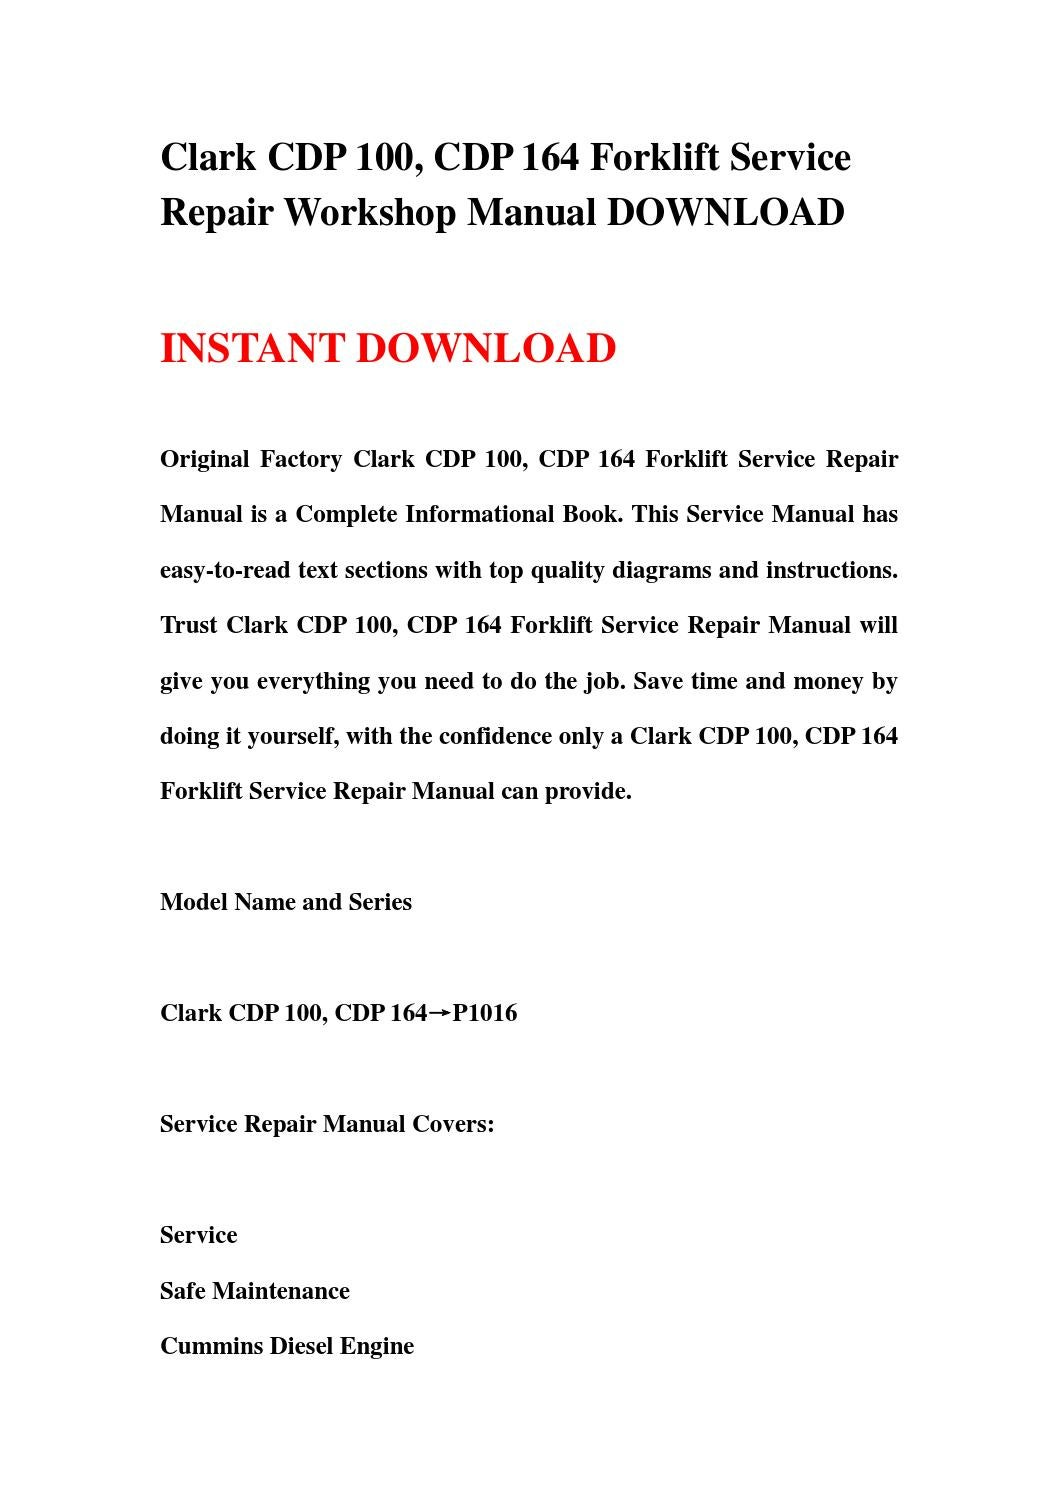 Download model 164 Service Manual